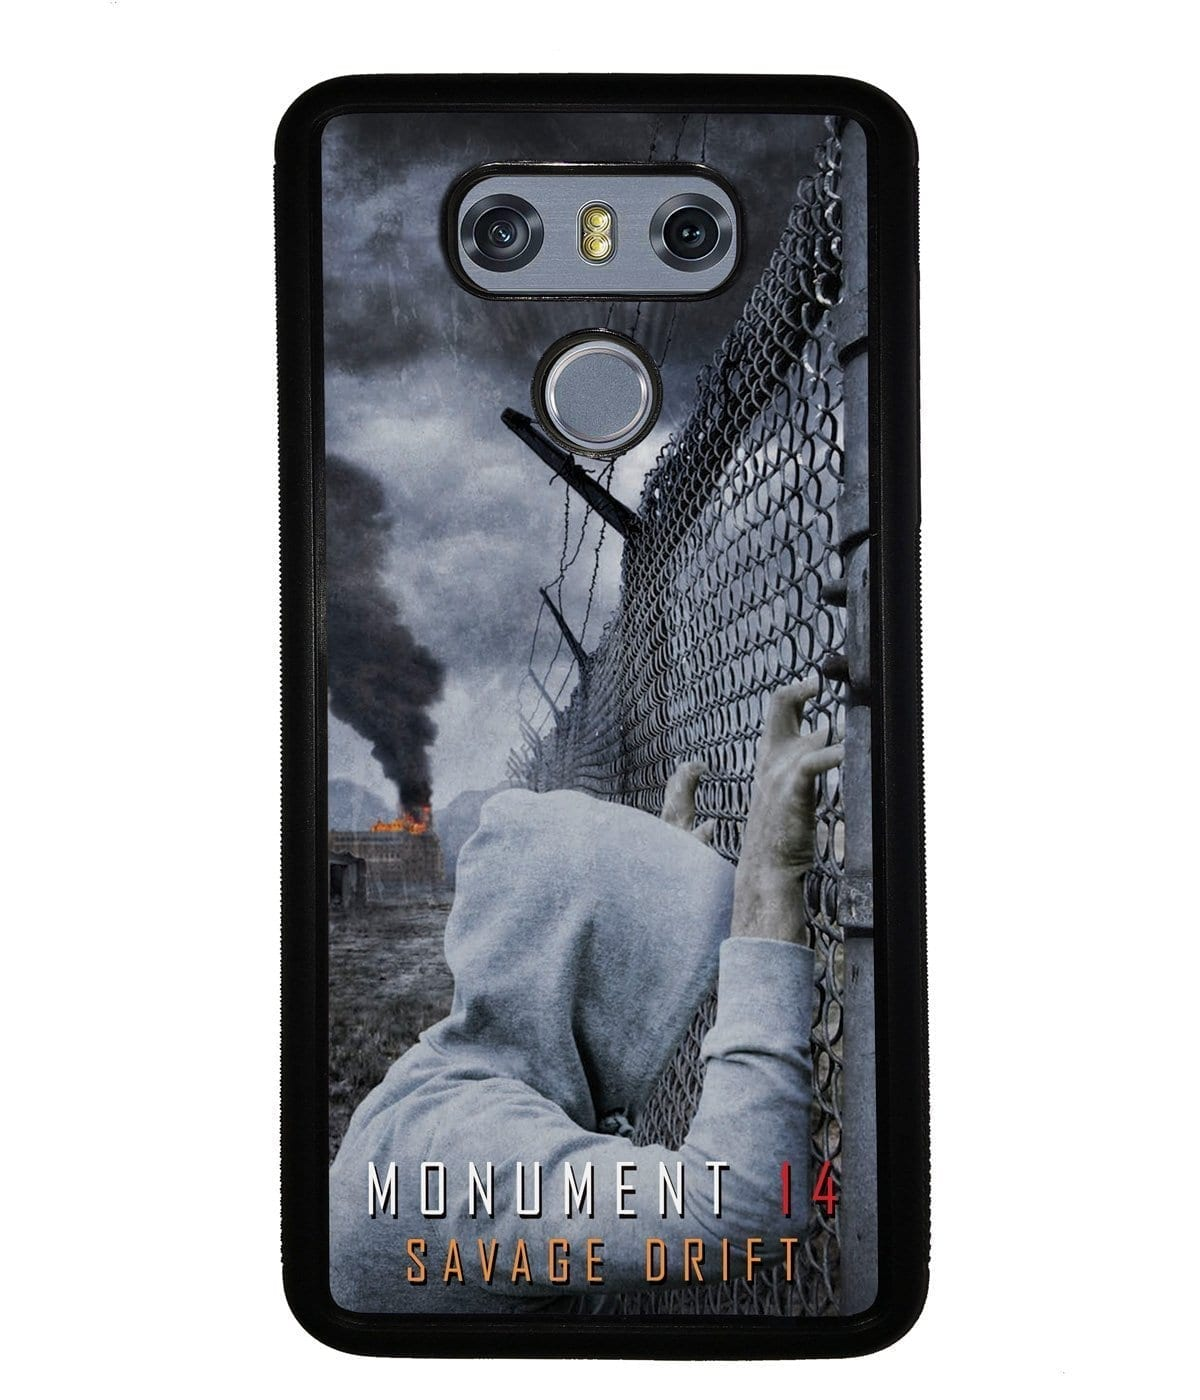 Monument 14: Savage Drift Phone Case (LG)